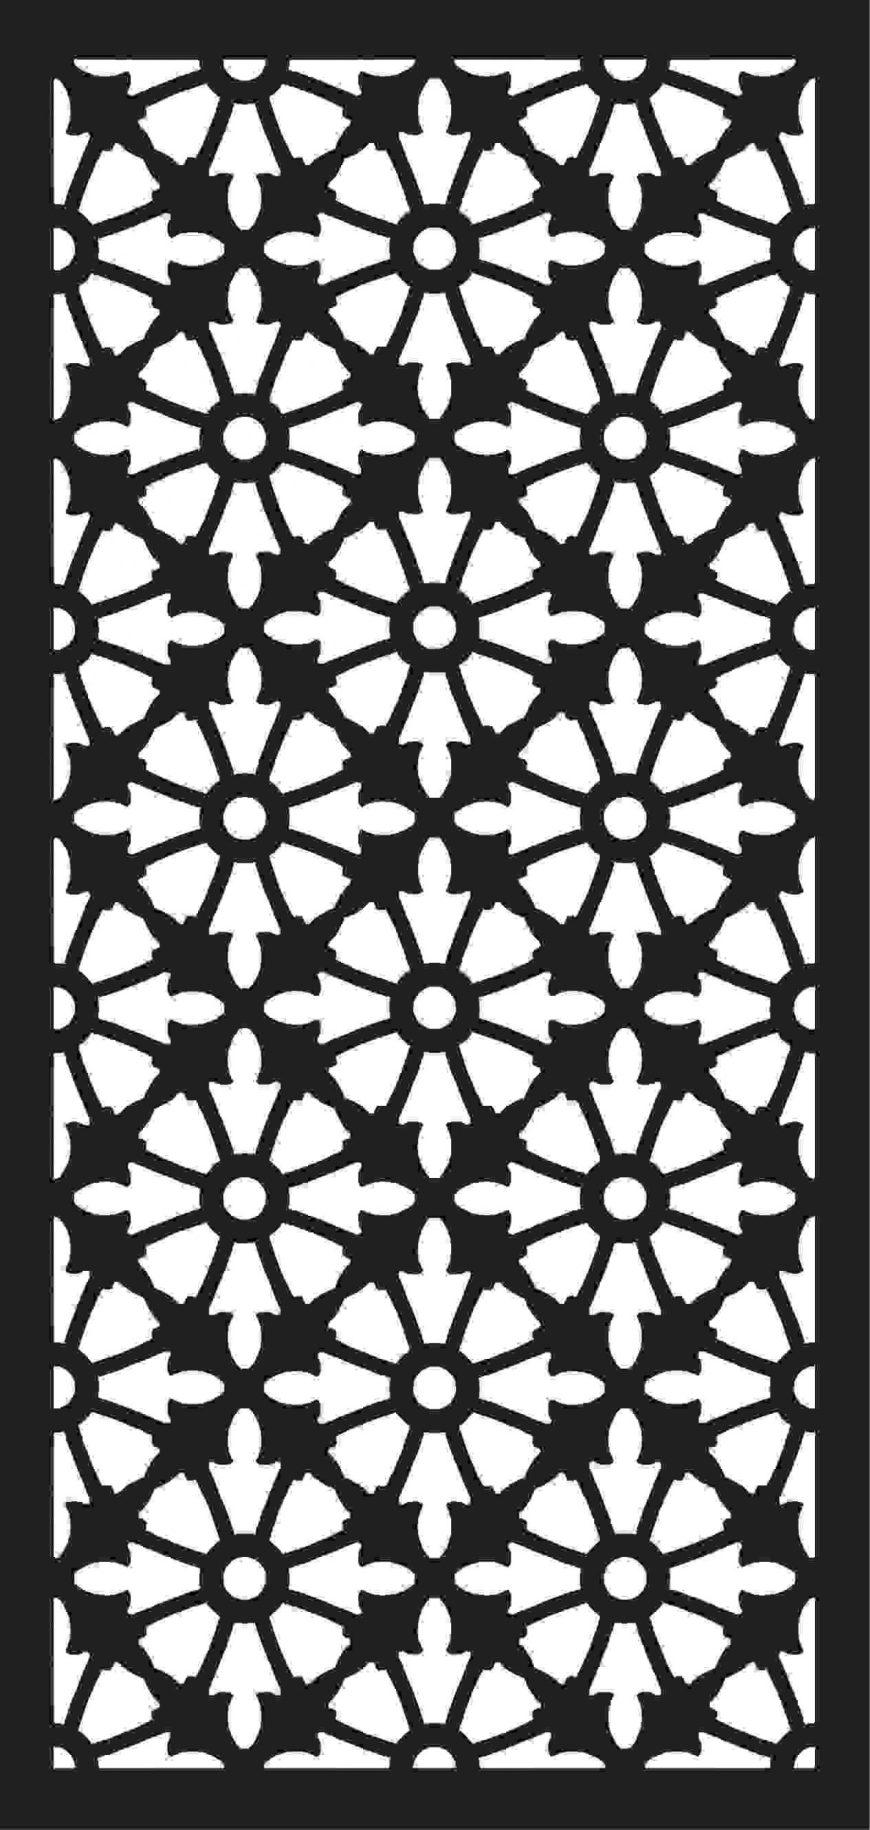 Screen Panel Patterns Seamless 51 Free DXF File